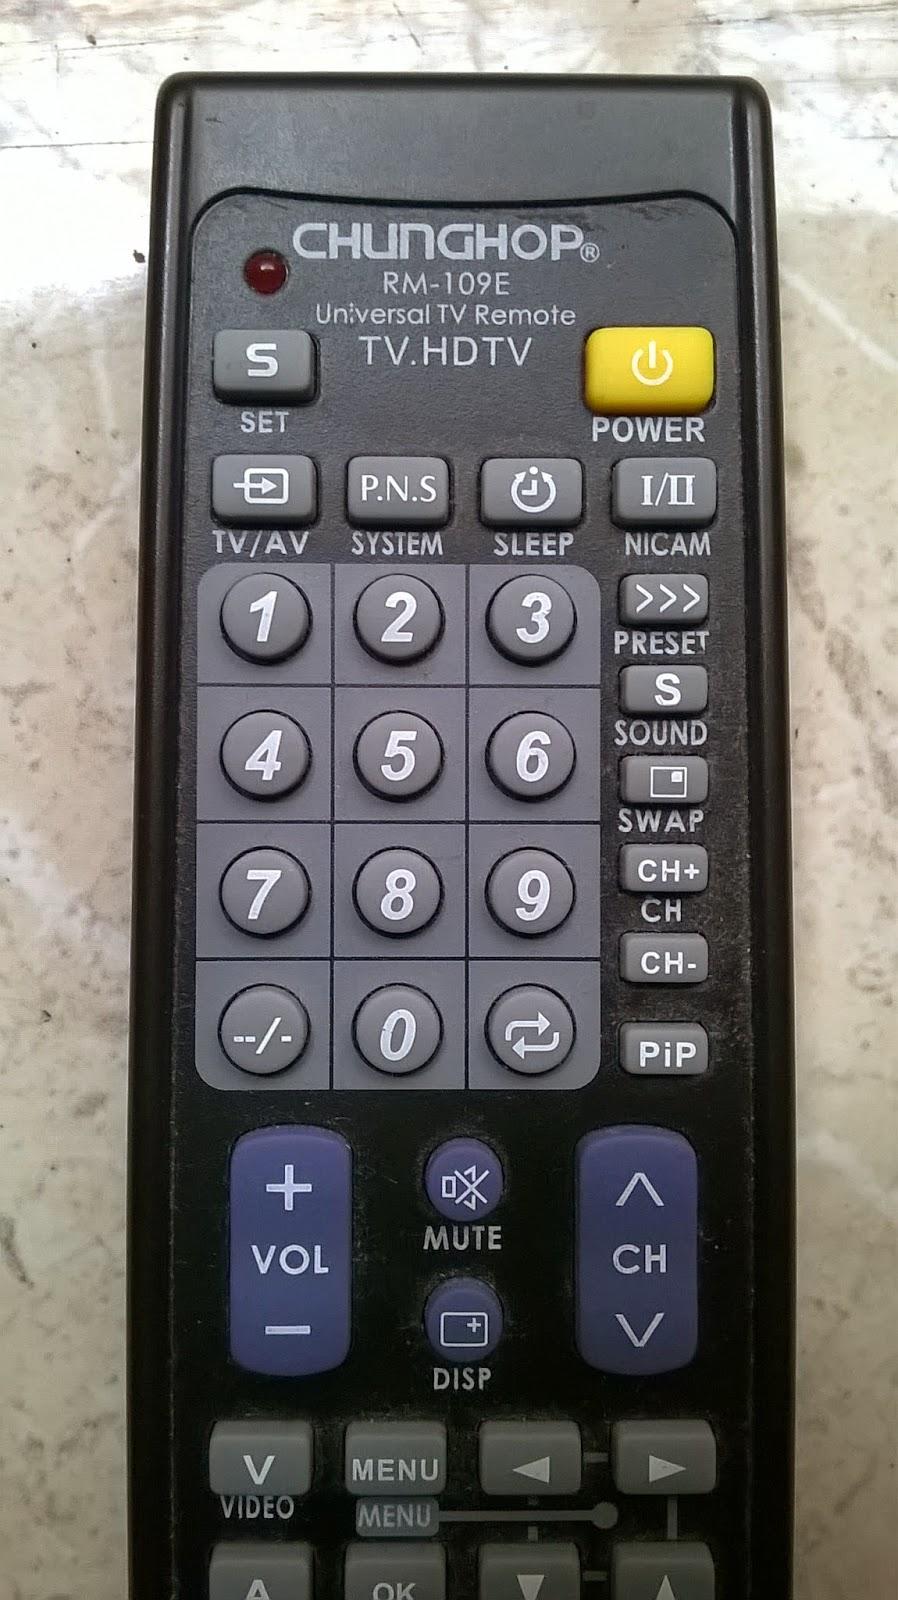 Cara Mudah Setting Universal Tv Remote Chunghop Rm109e Seberkas